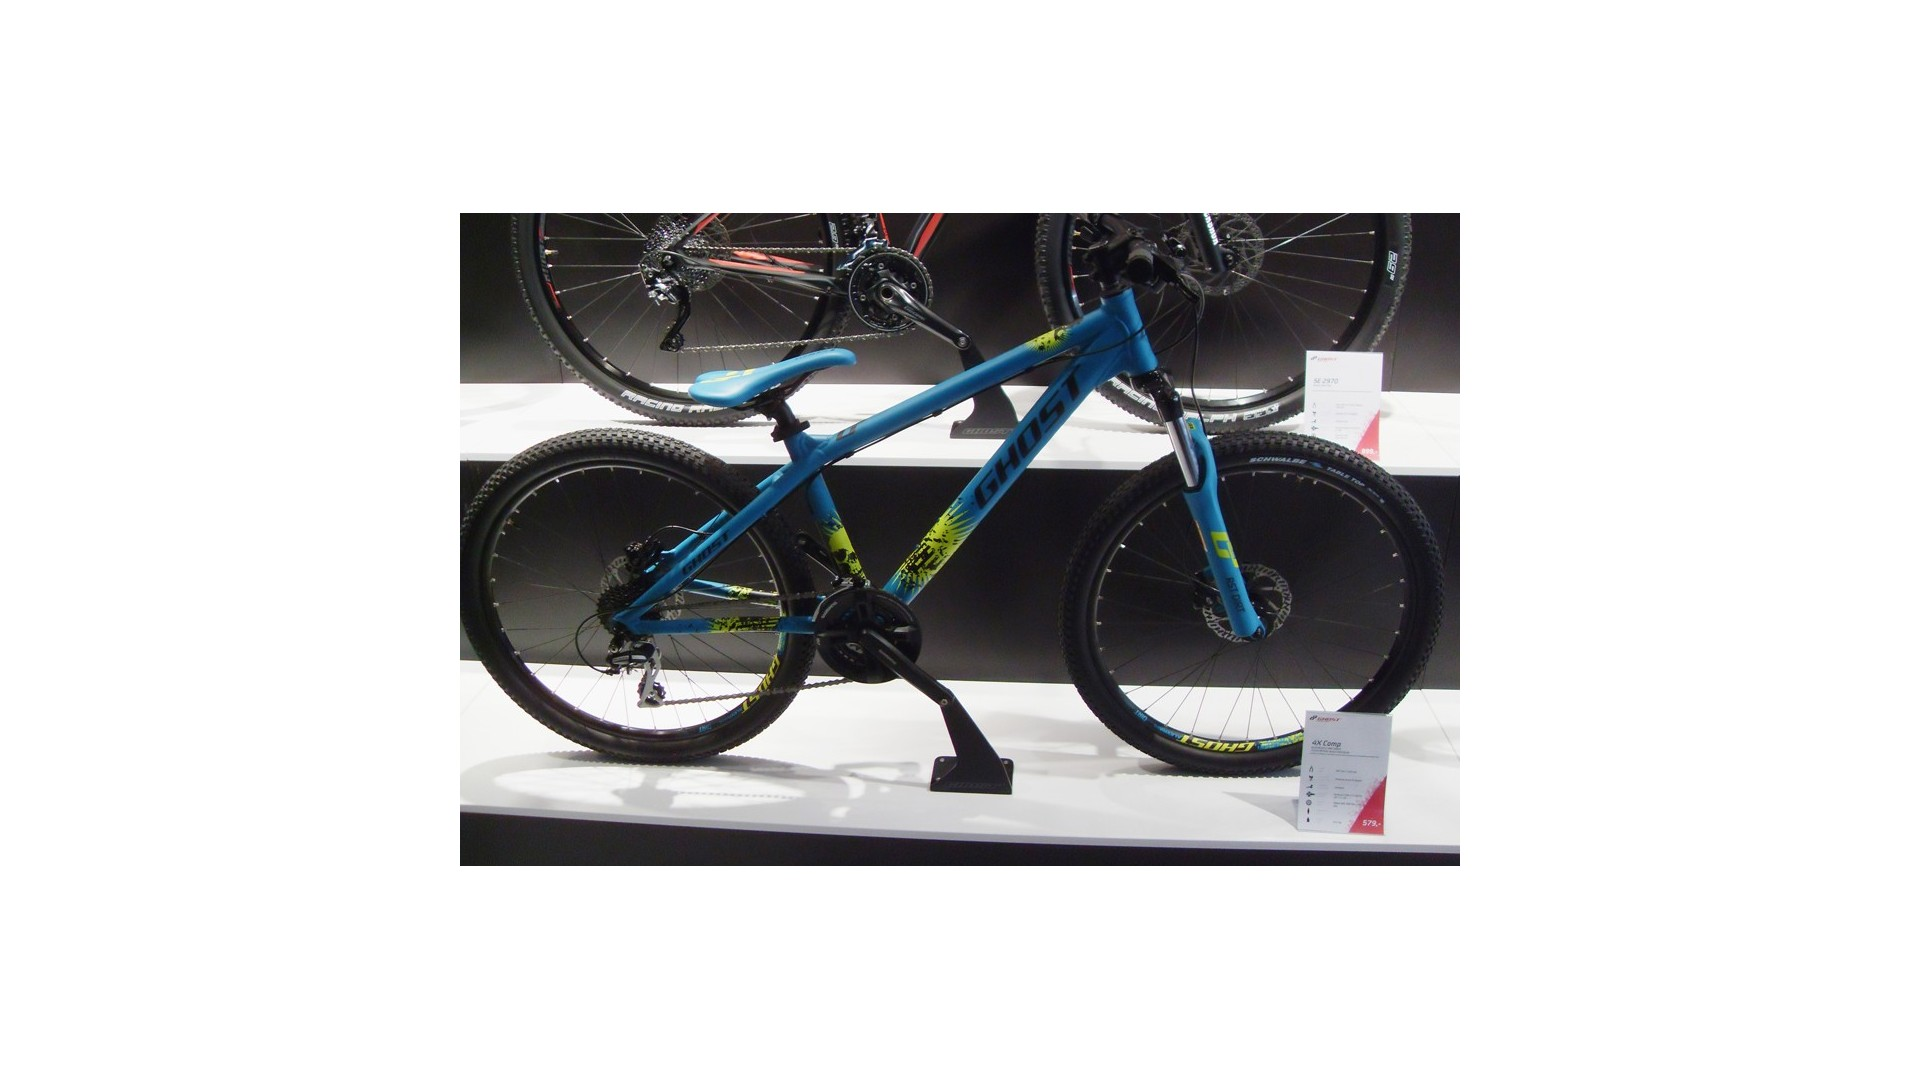 Велосипед GHOST 4-x Comp blue/black/lime green год 2014